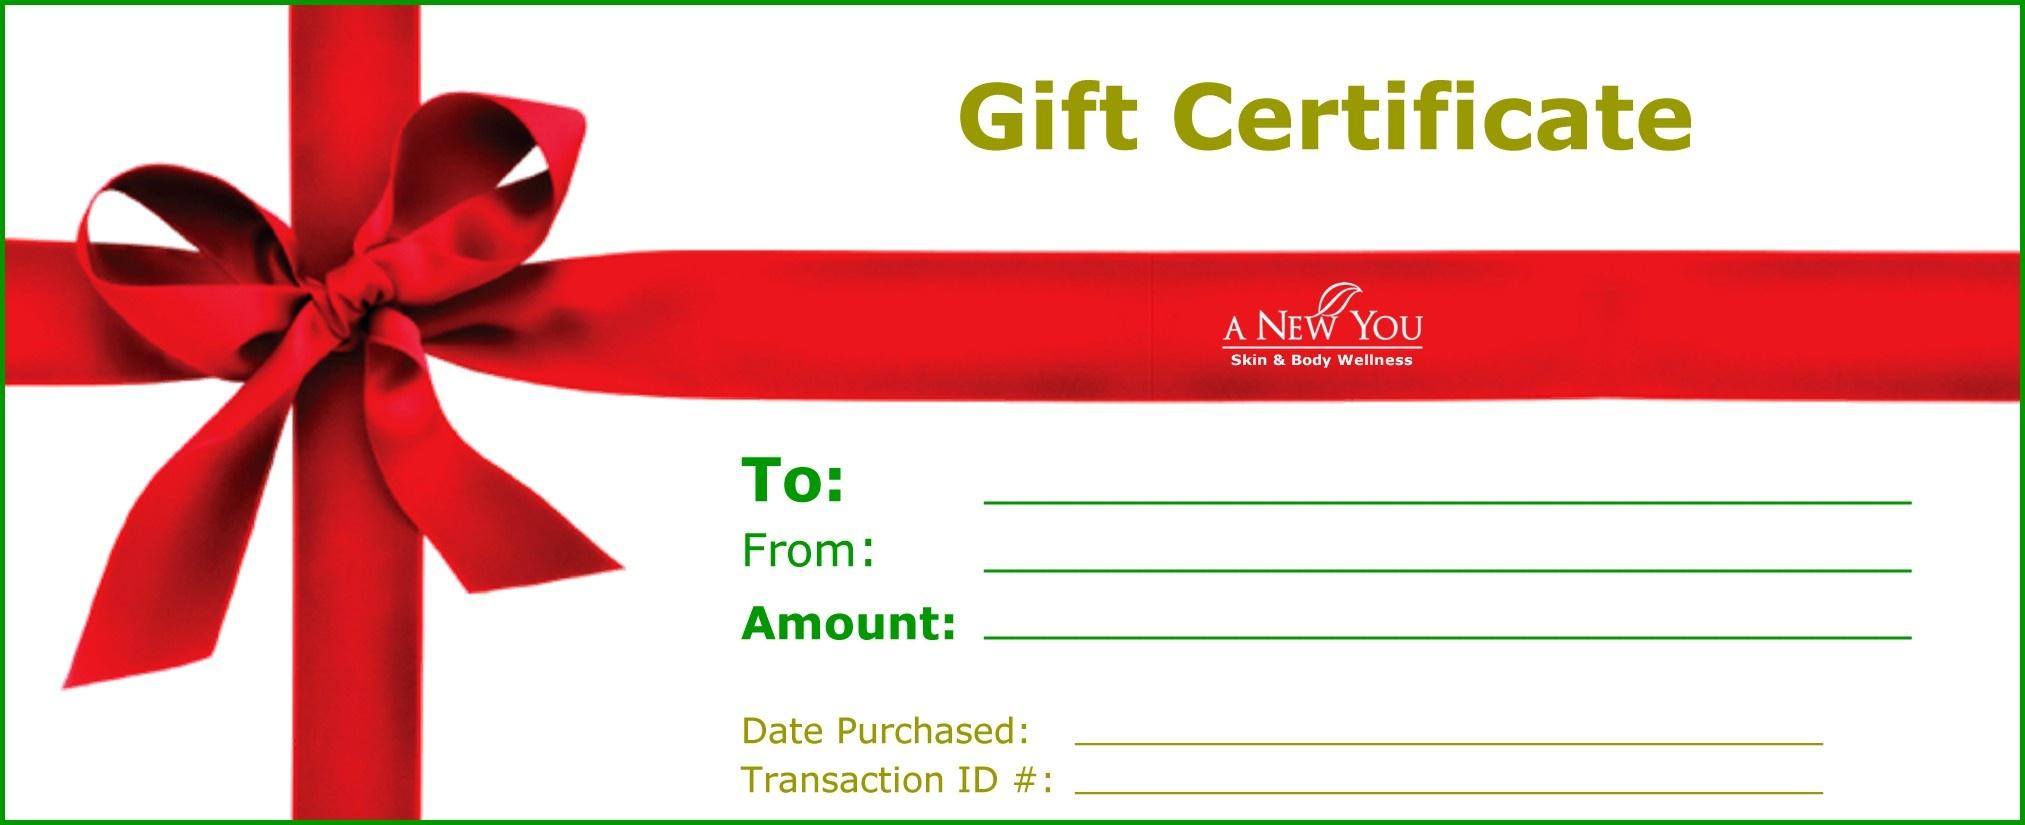 Restaurant Gift Certificates Printing | Print Gift Vouchers Online - Free Printable Gift Vouchers Uk